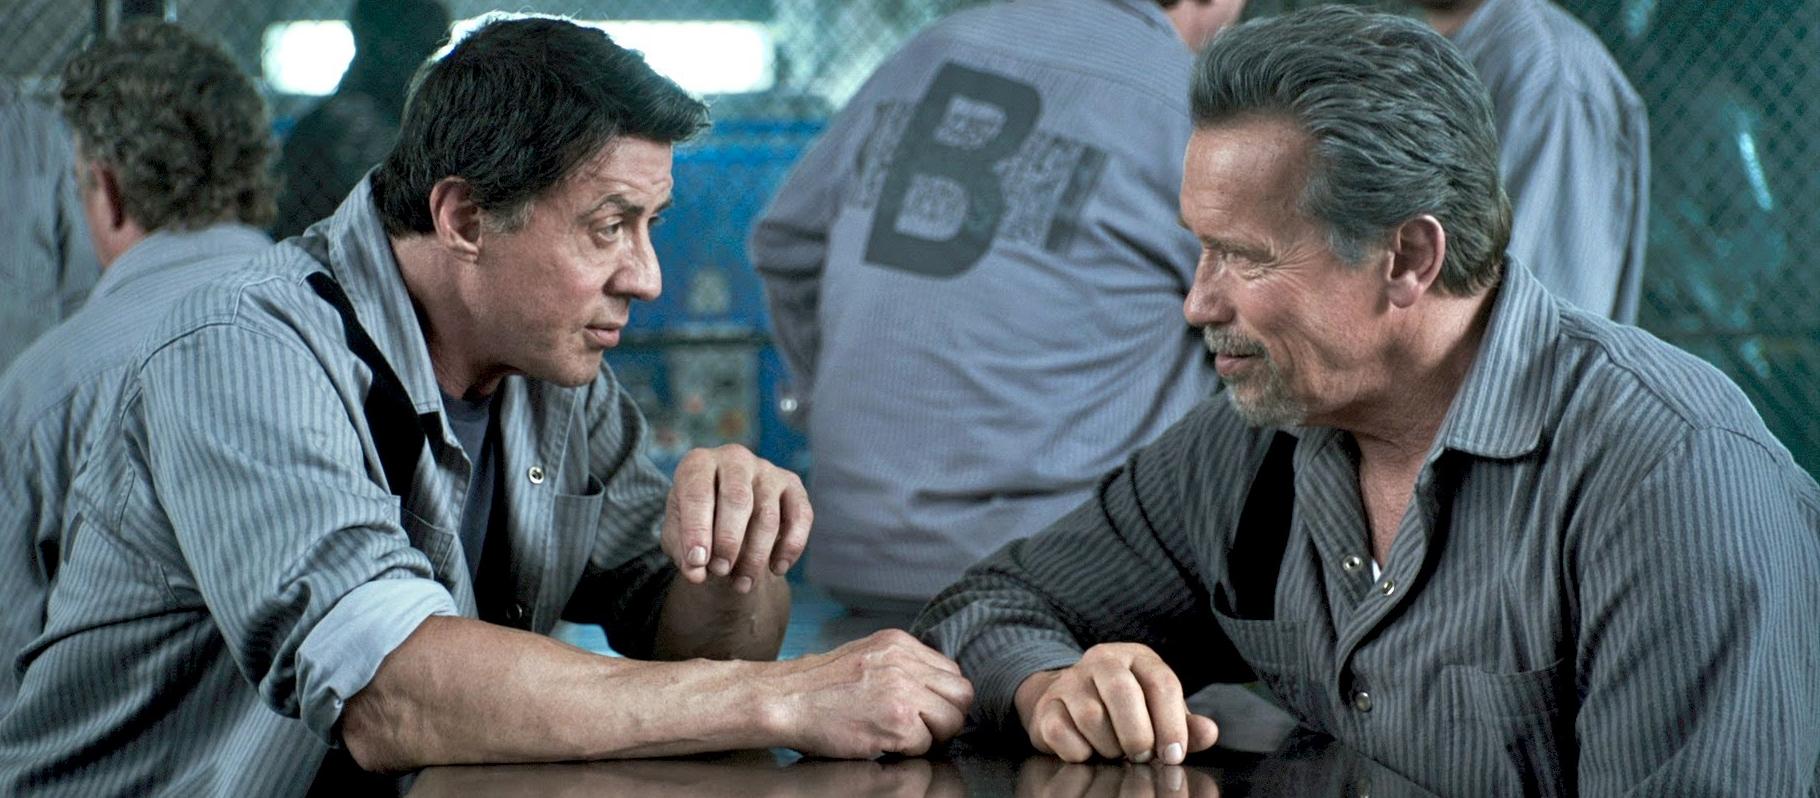 Sylvester Stallone Is Returning For Escape Plan 2  Sylvester Stall...